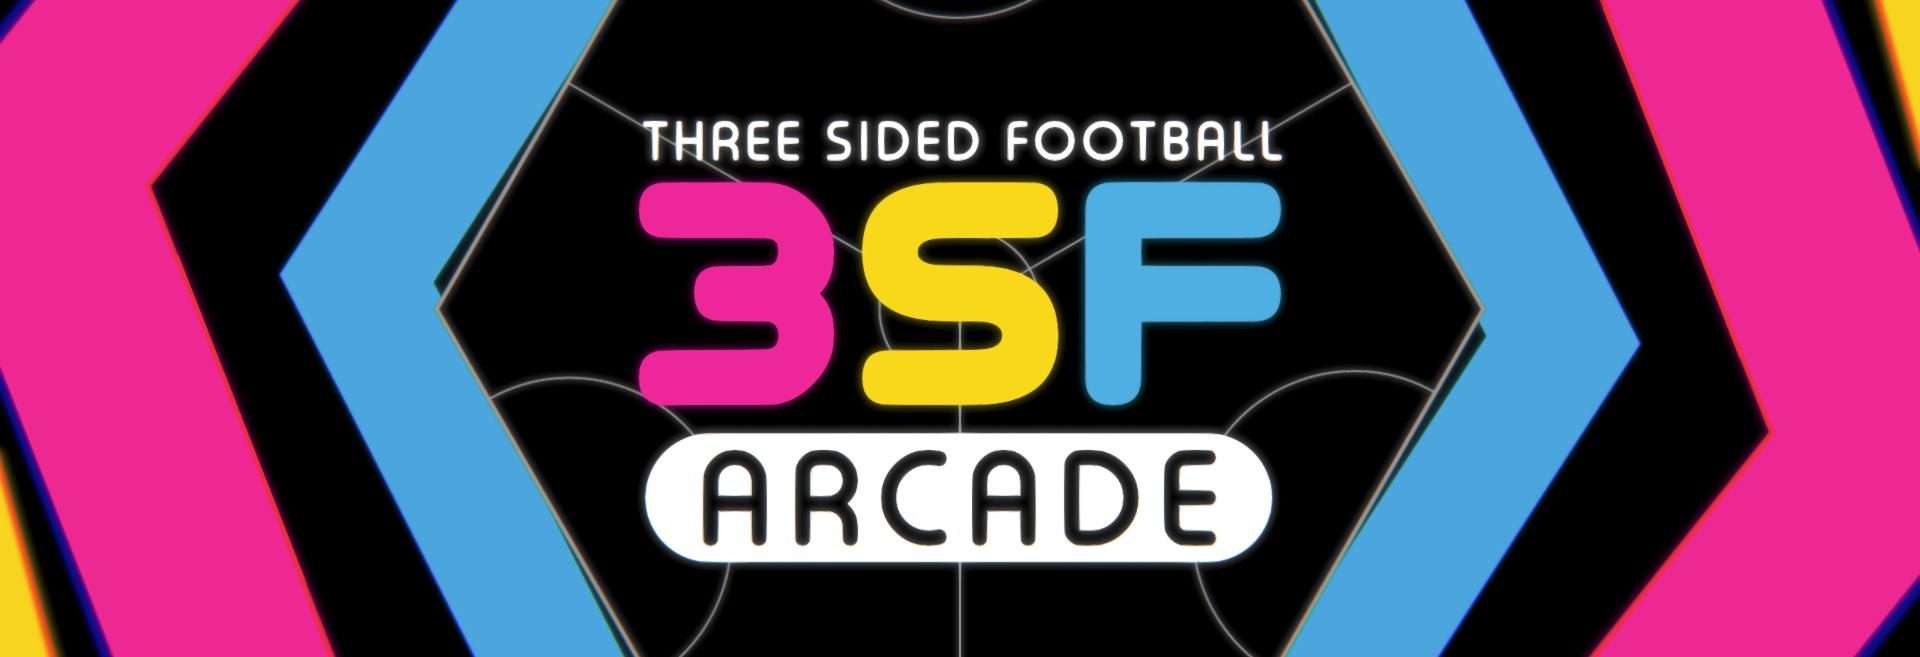 3 Sided Football Arcade